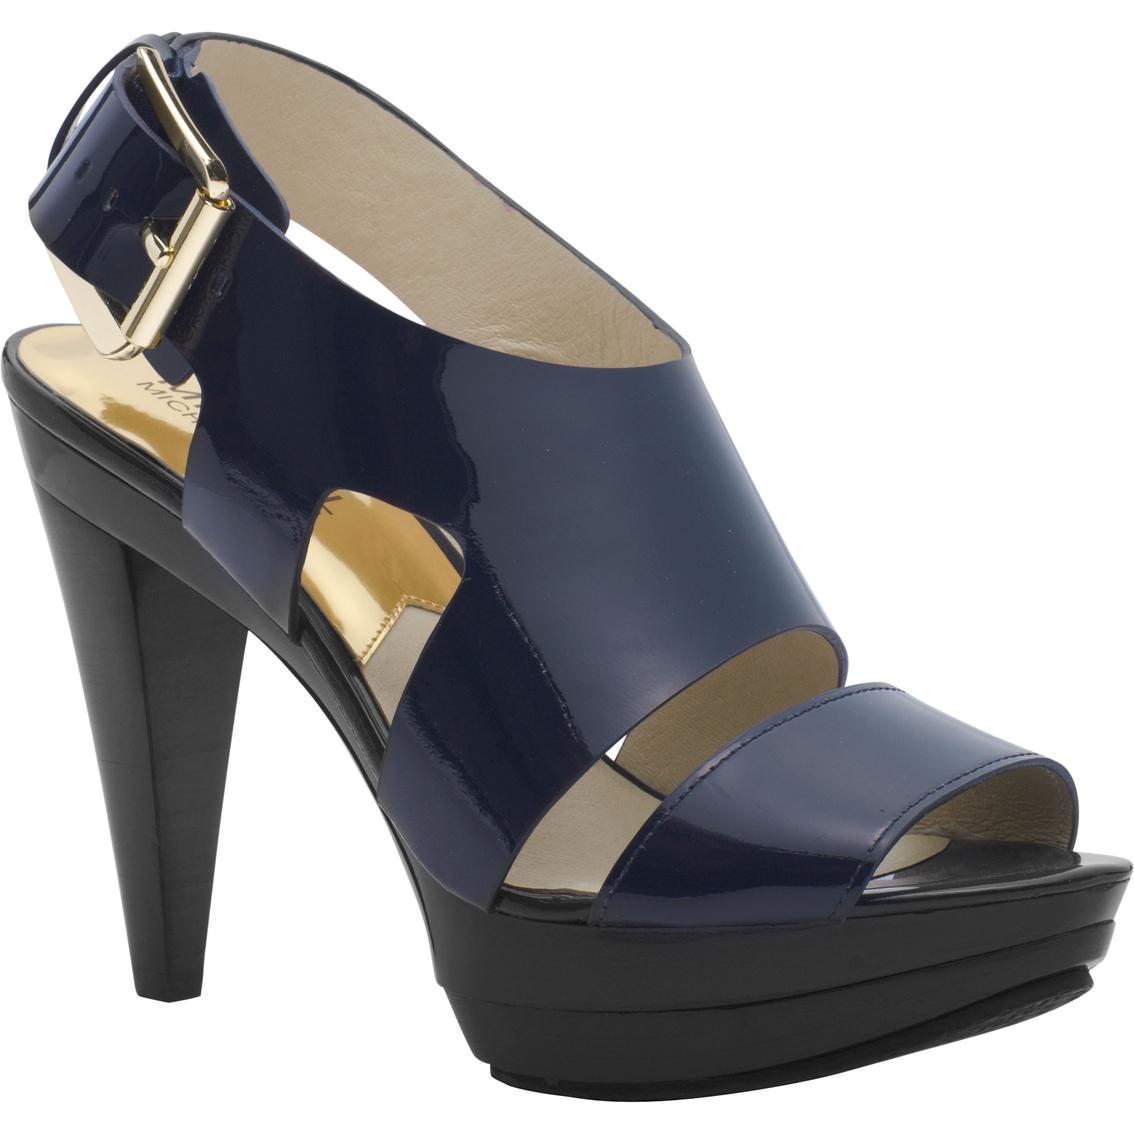 148b8b3d893b Michael Kors Carla Platform Sandals